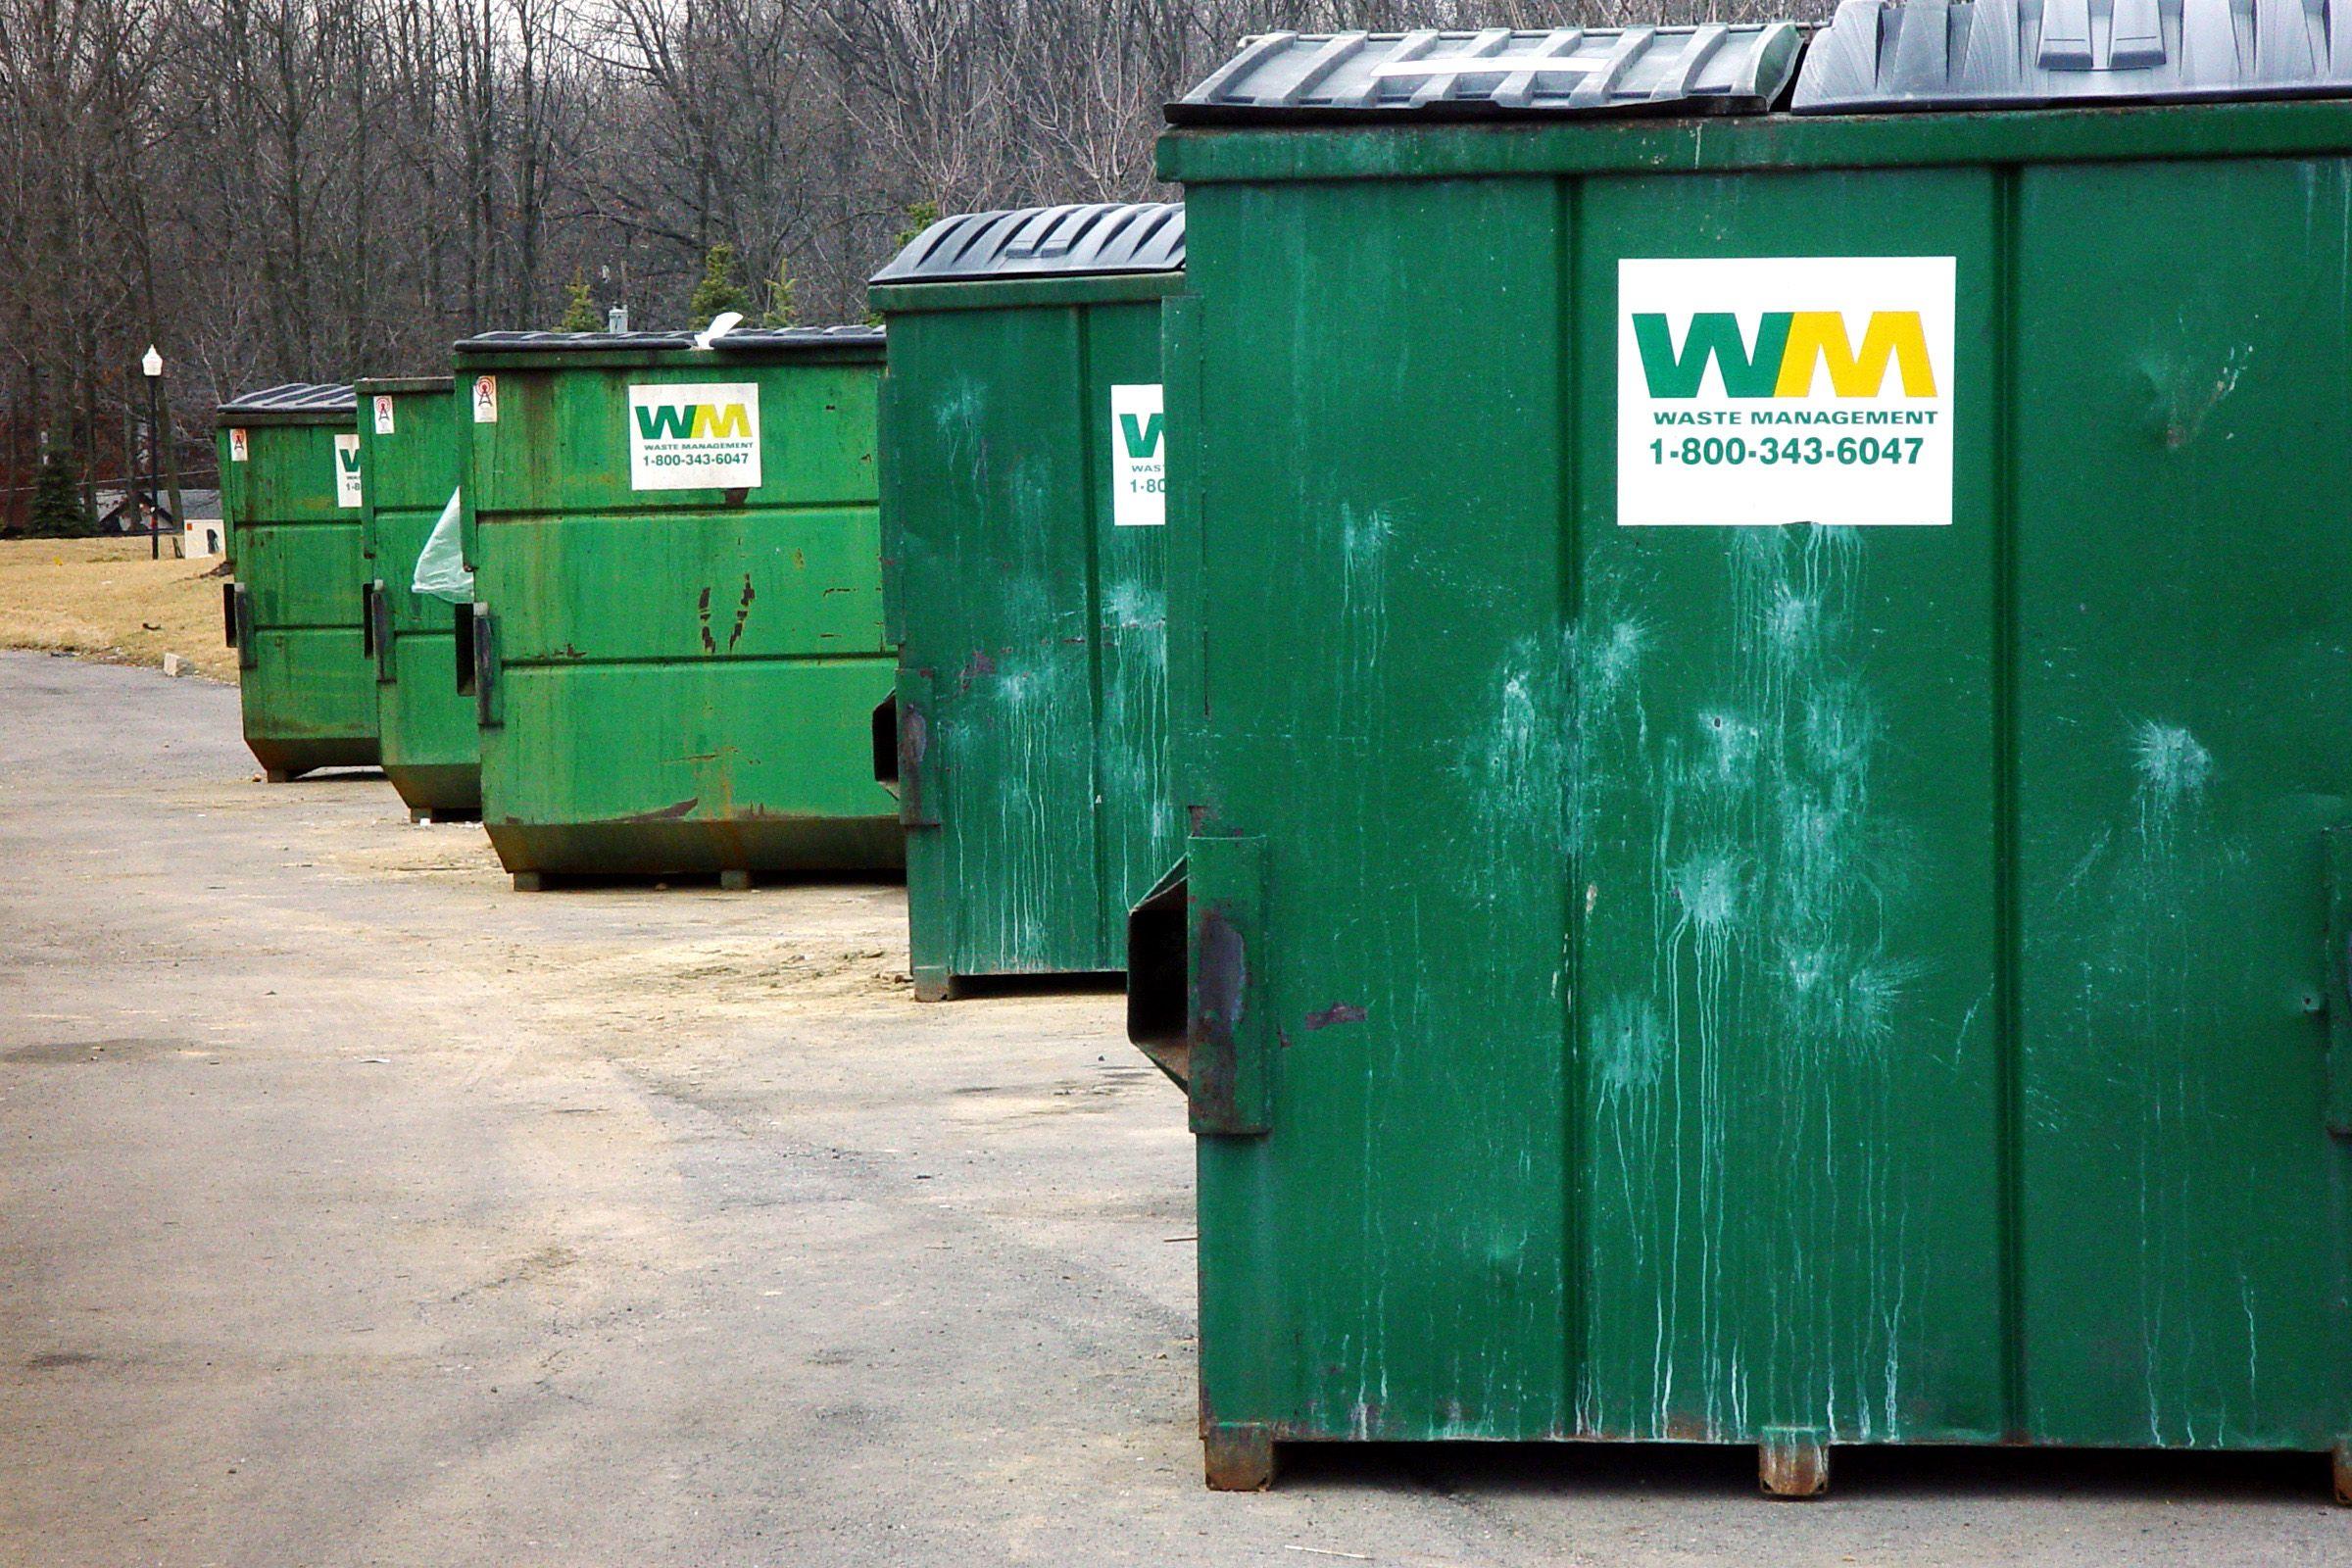 Drunk Fall Asleep In Dumpster End Up Garbage Truck Thatsjustinsane Com Diving Backyard Office On Essay